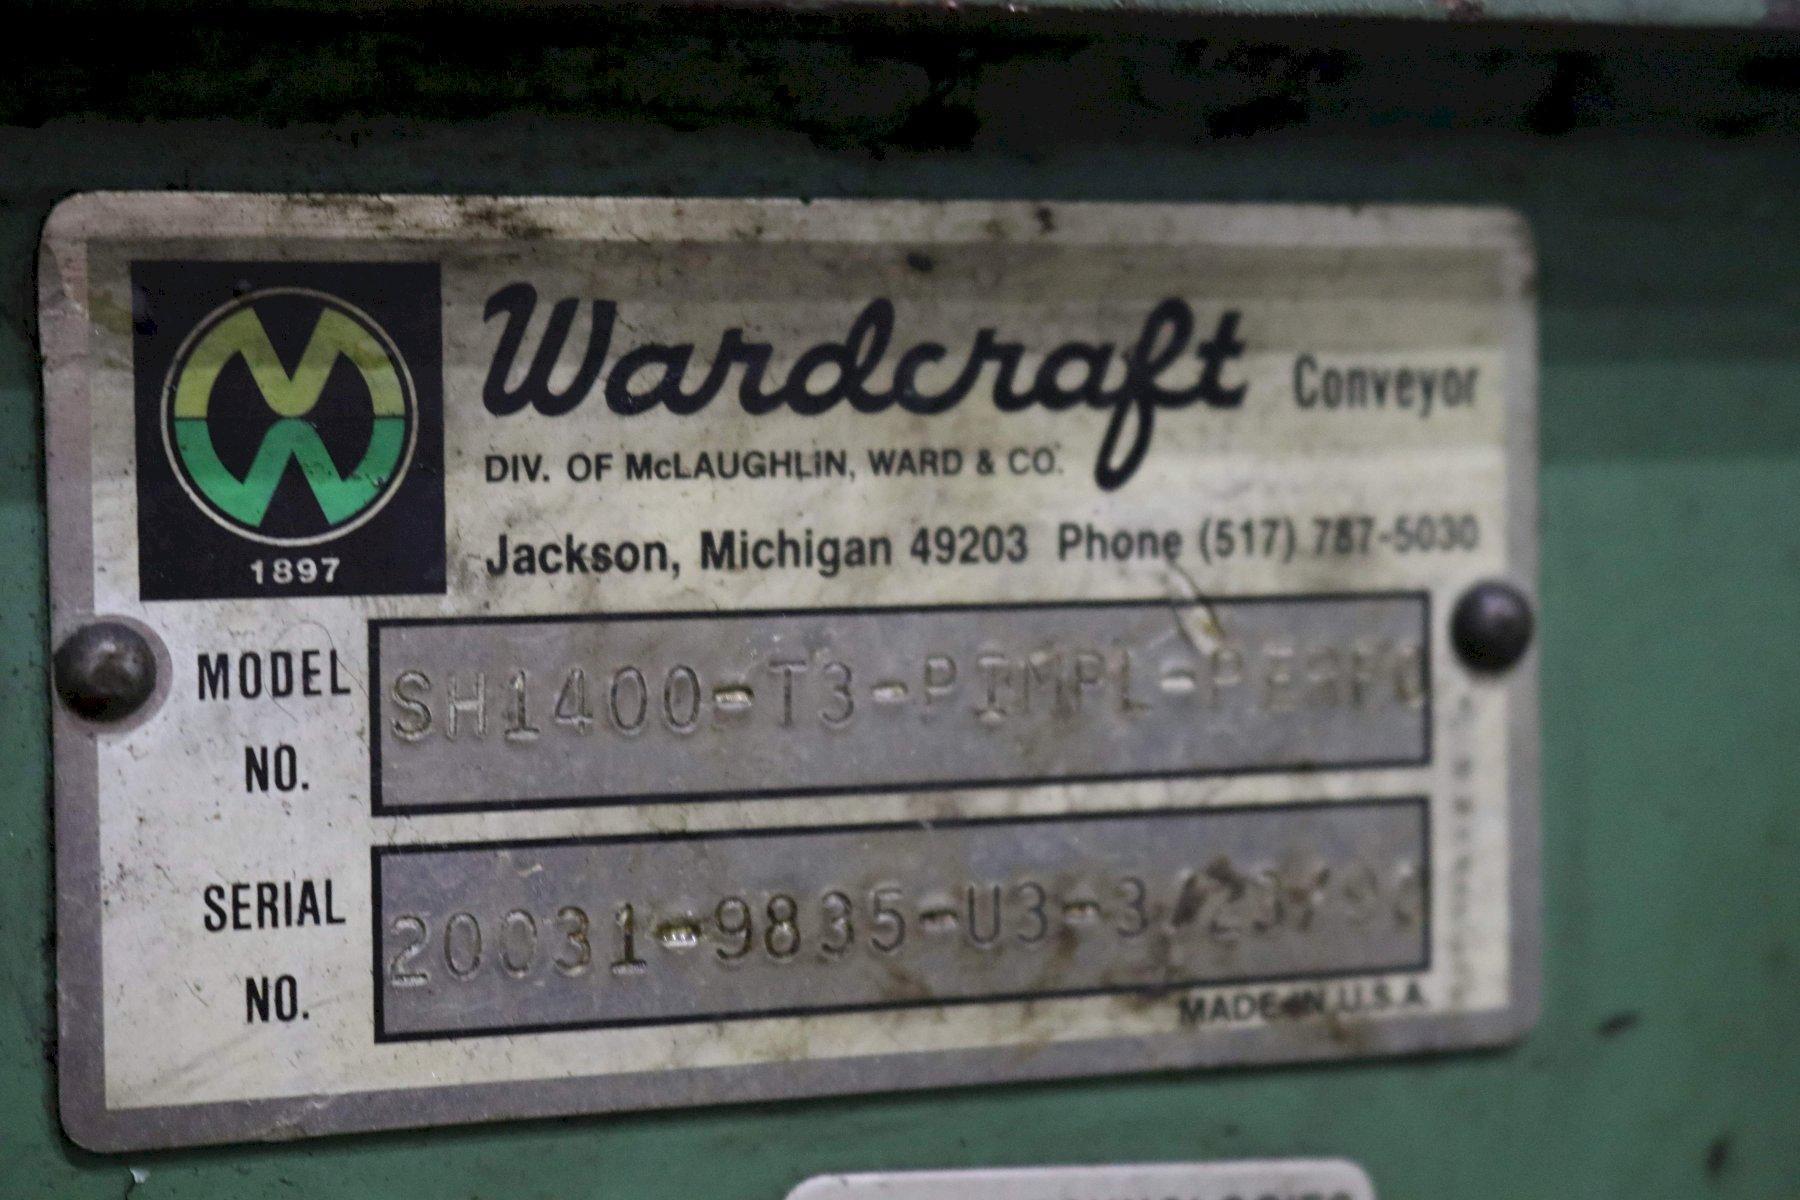 WARDCRAFT STEEL CLEATED CONVEYOR: STOCK # 72837